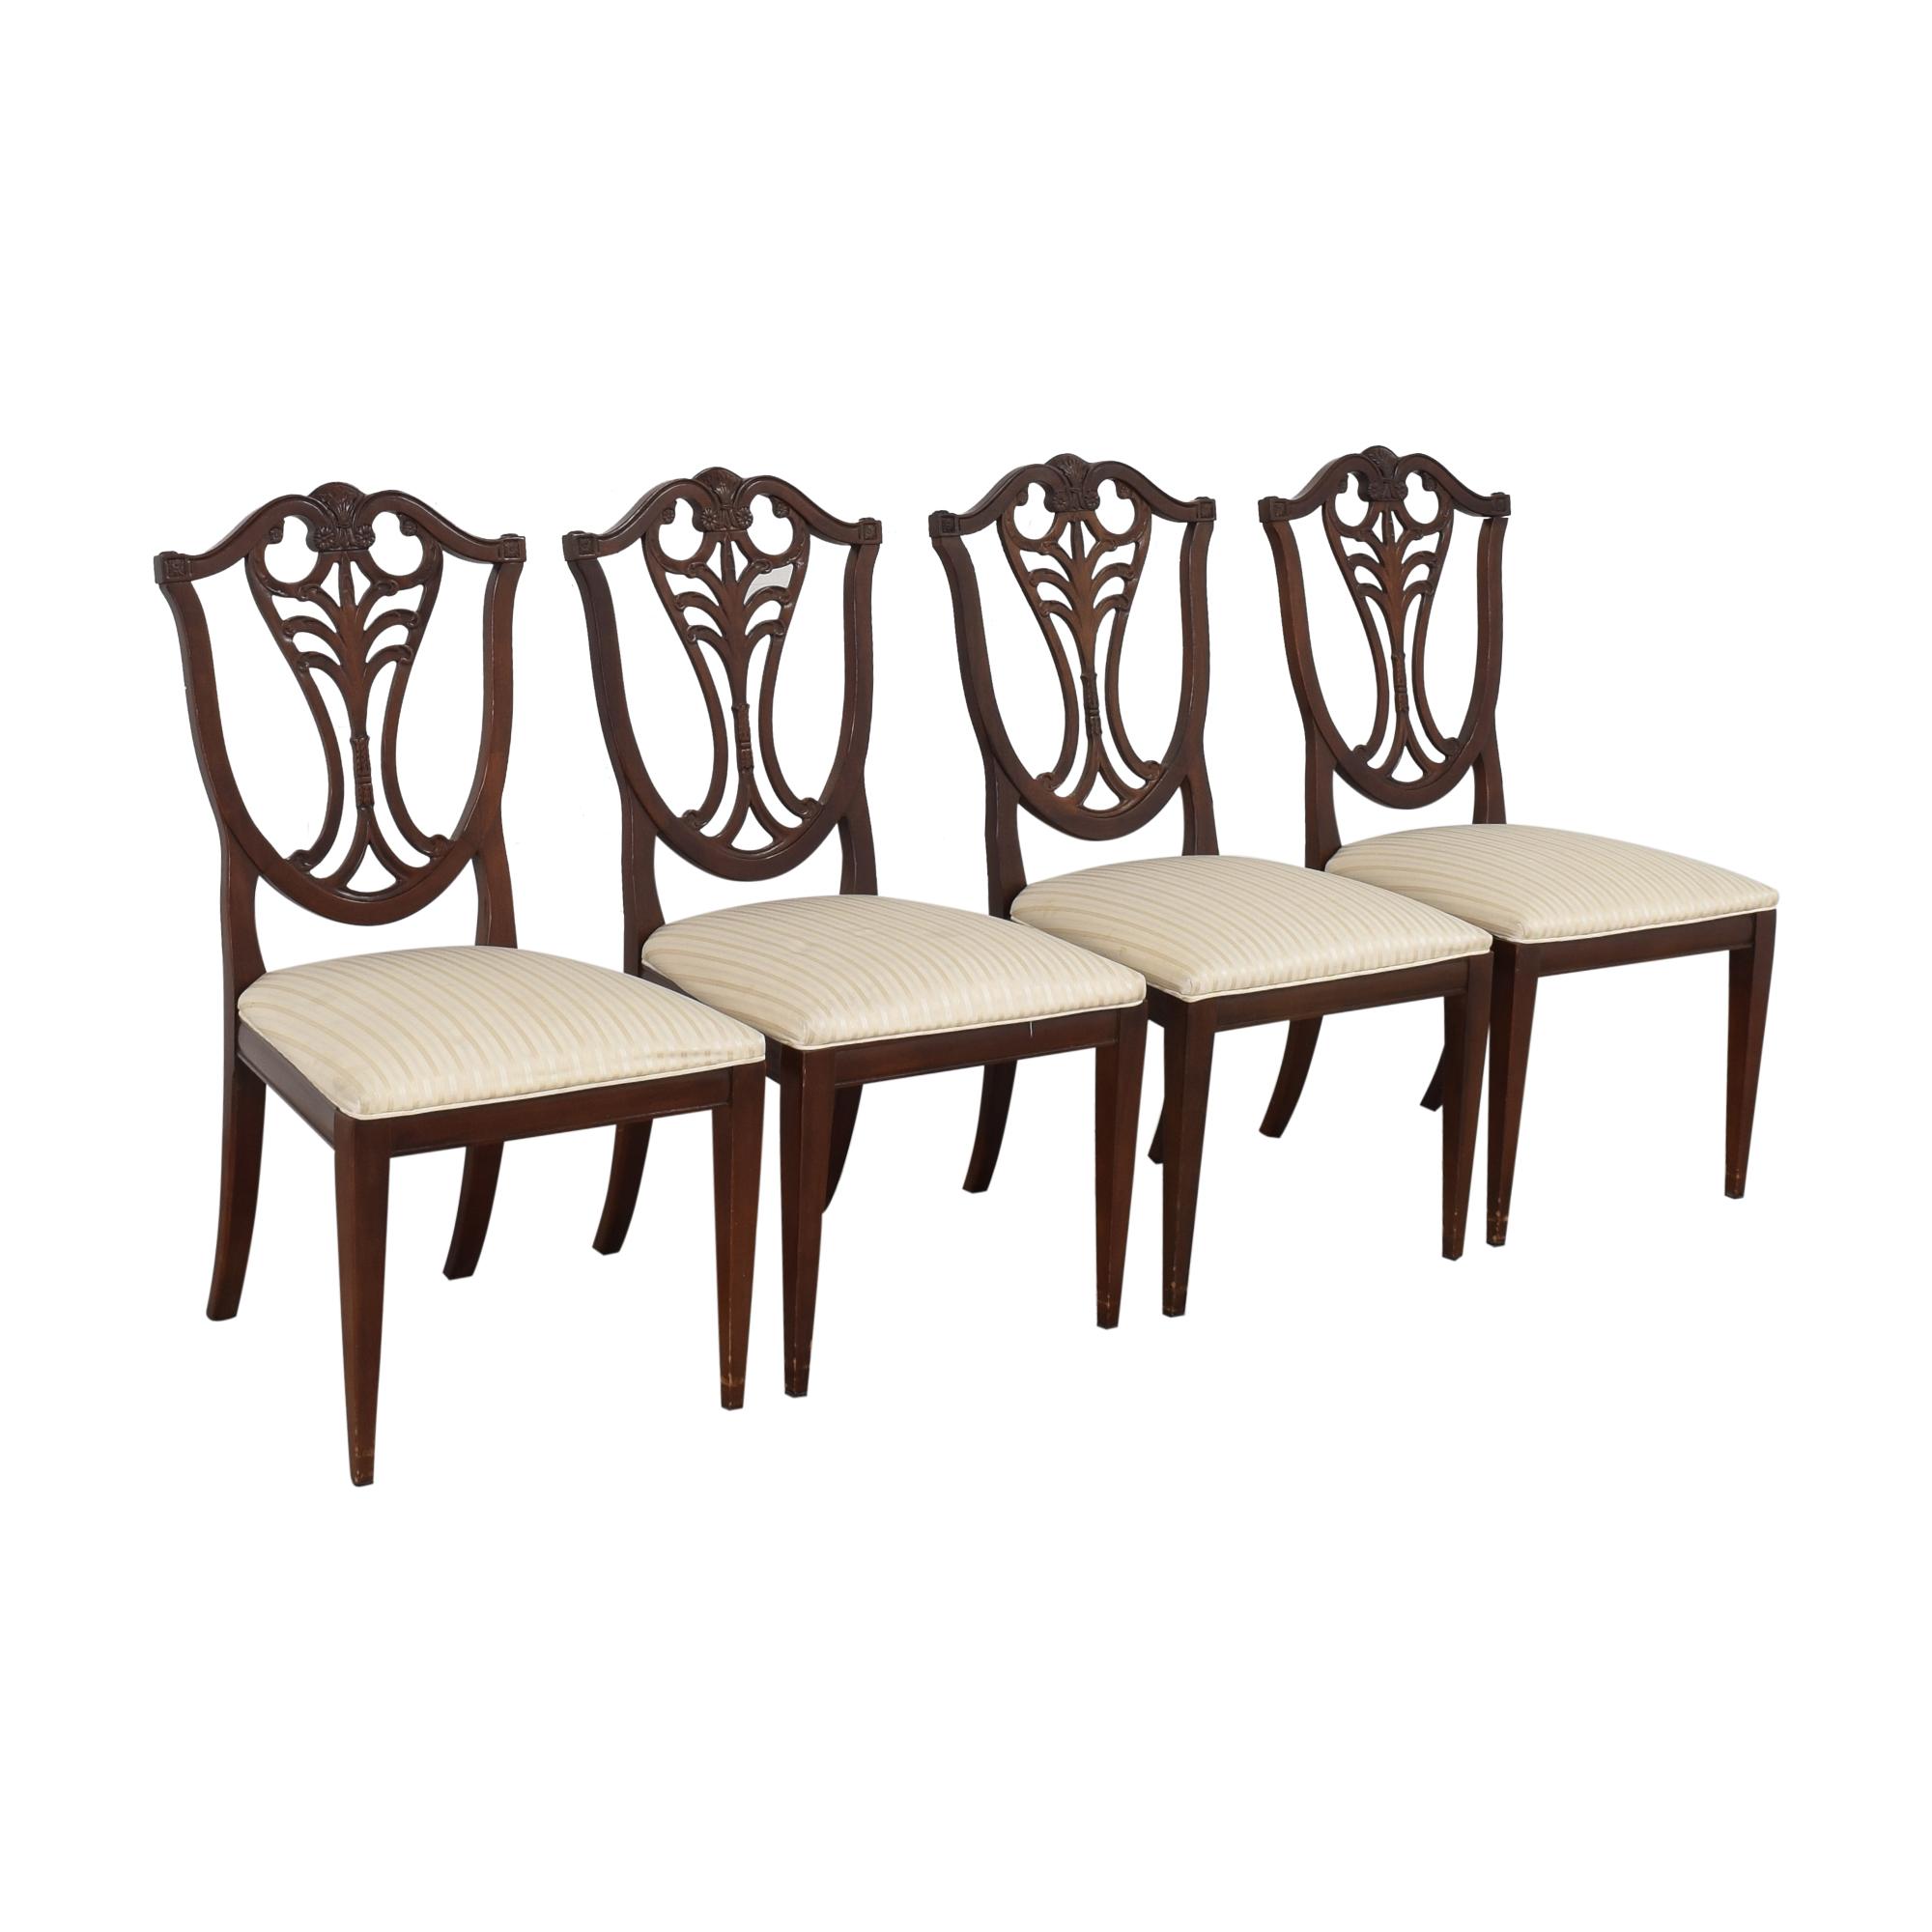 Henredon Furniture Henredon Furniture Dining Chairs Dining Chairs